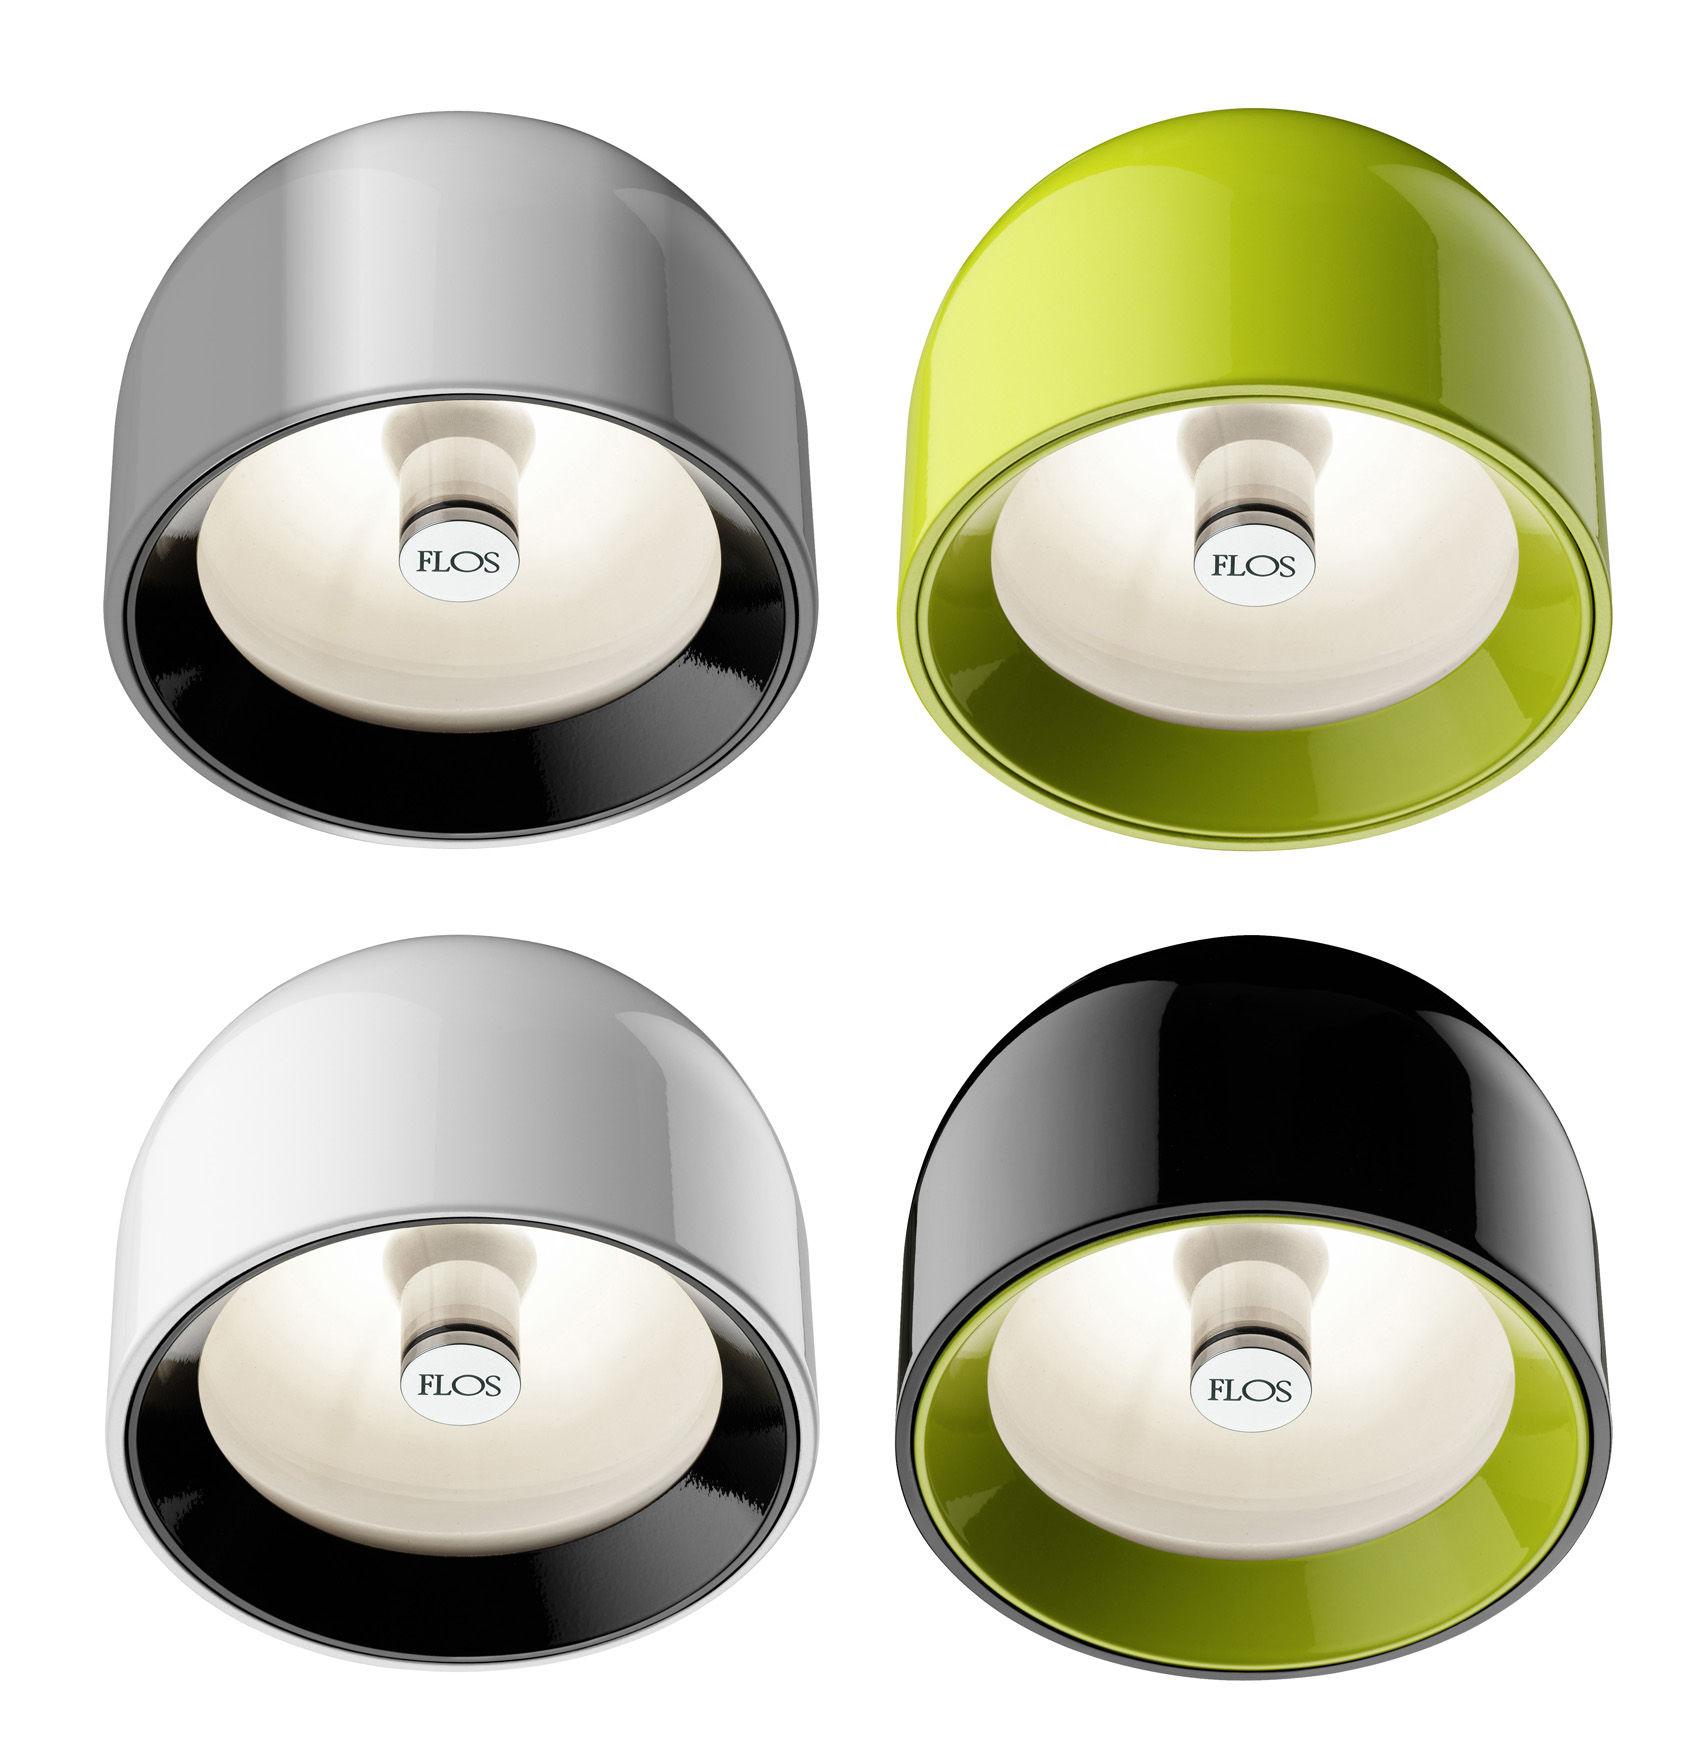 wan wall light ceiling light green by flos. Black Bedroom Furniture Sets. Home Design Ideas